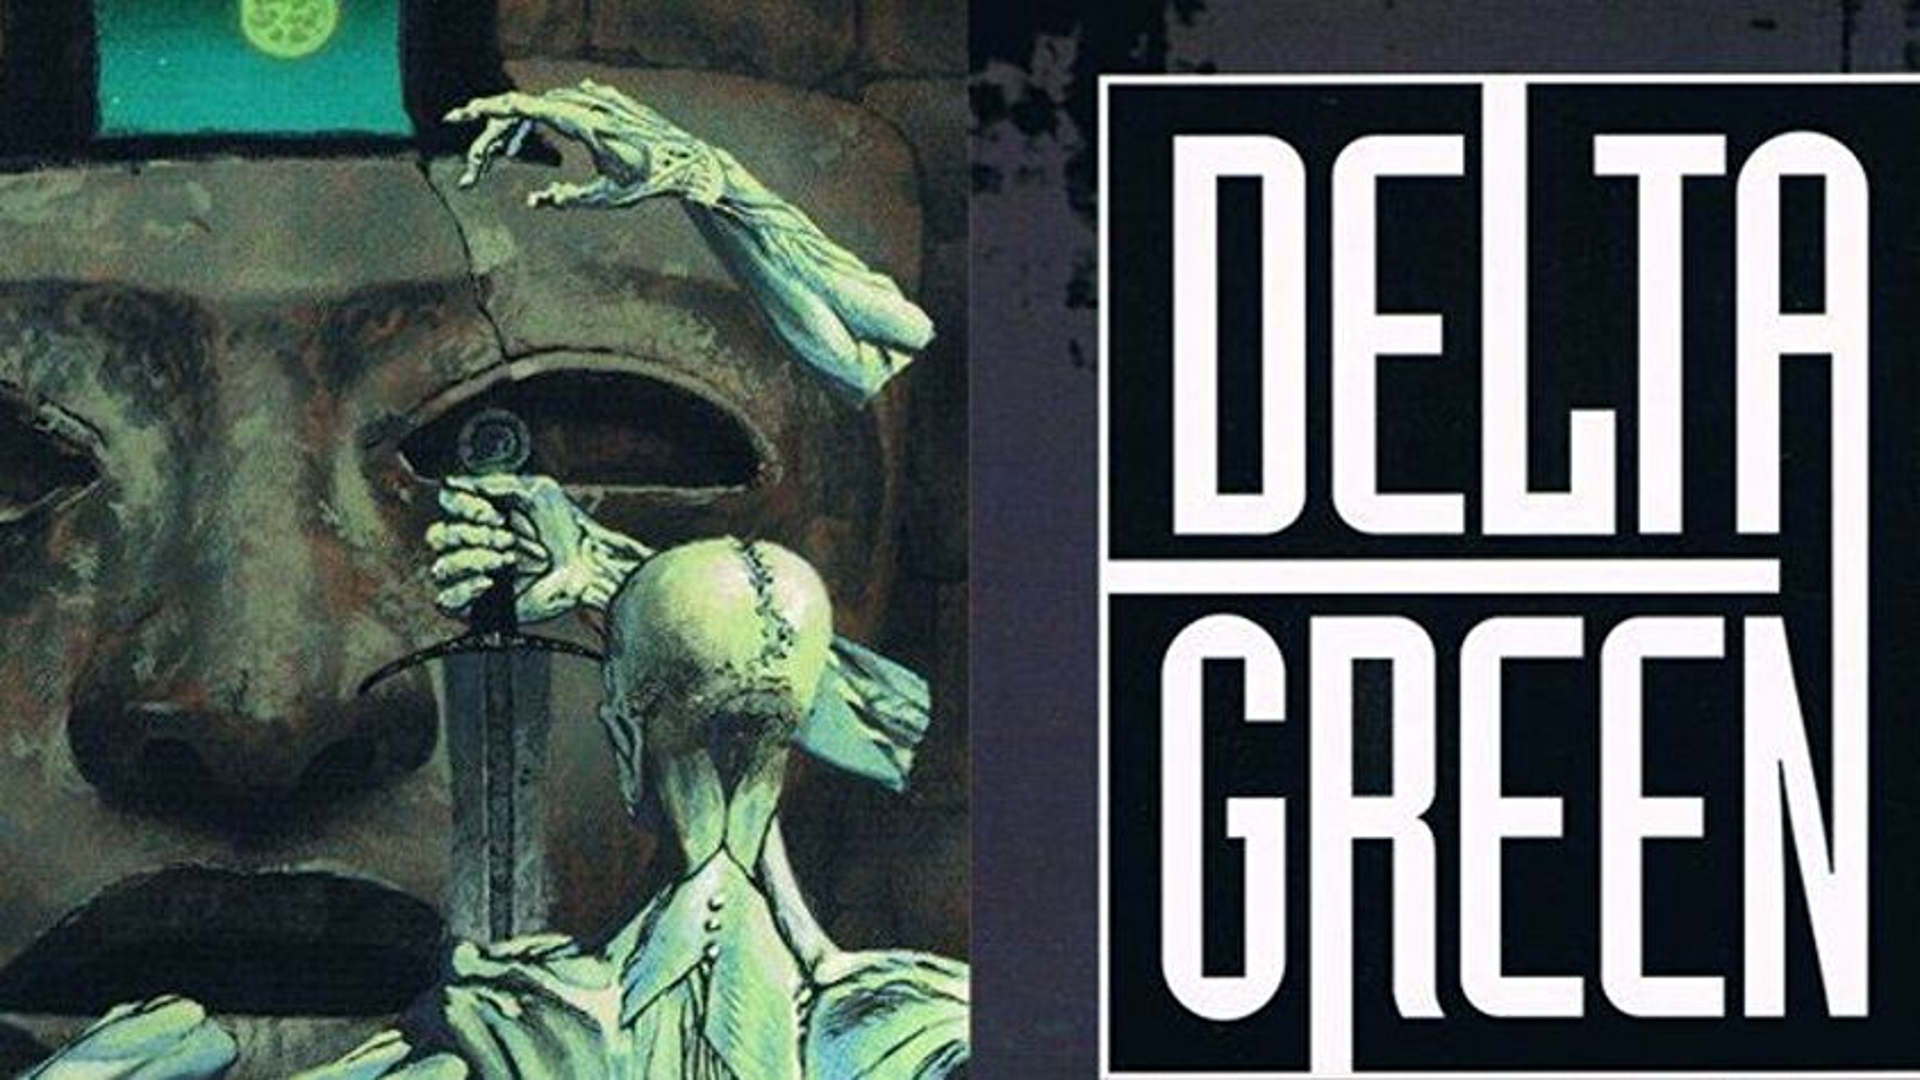 Delta Green RPG cover artwork 2